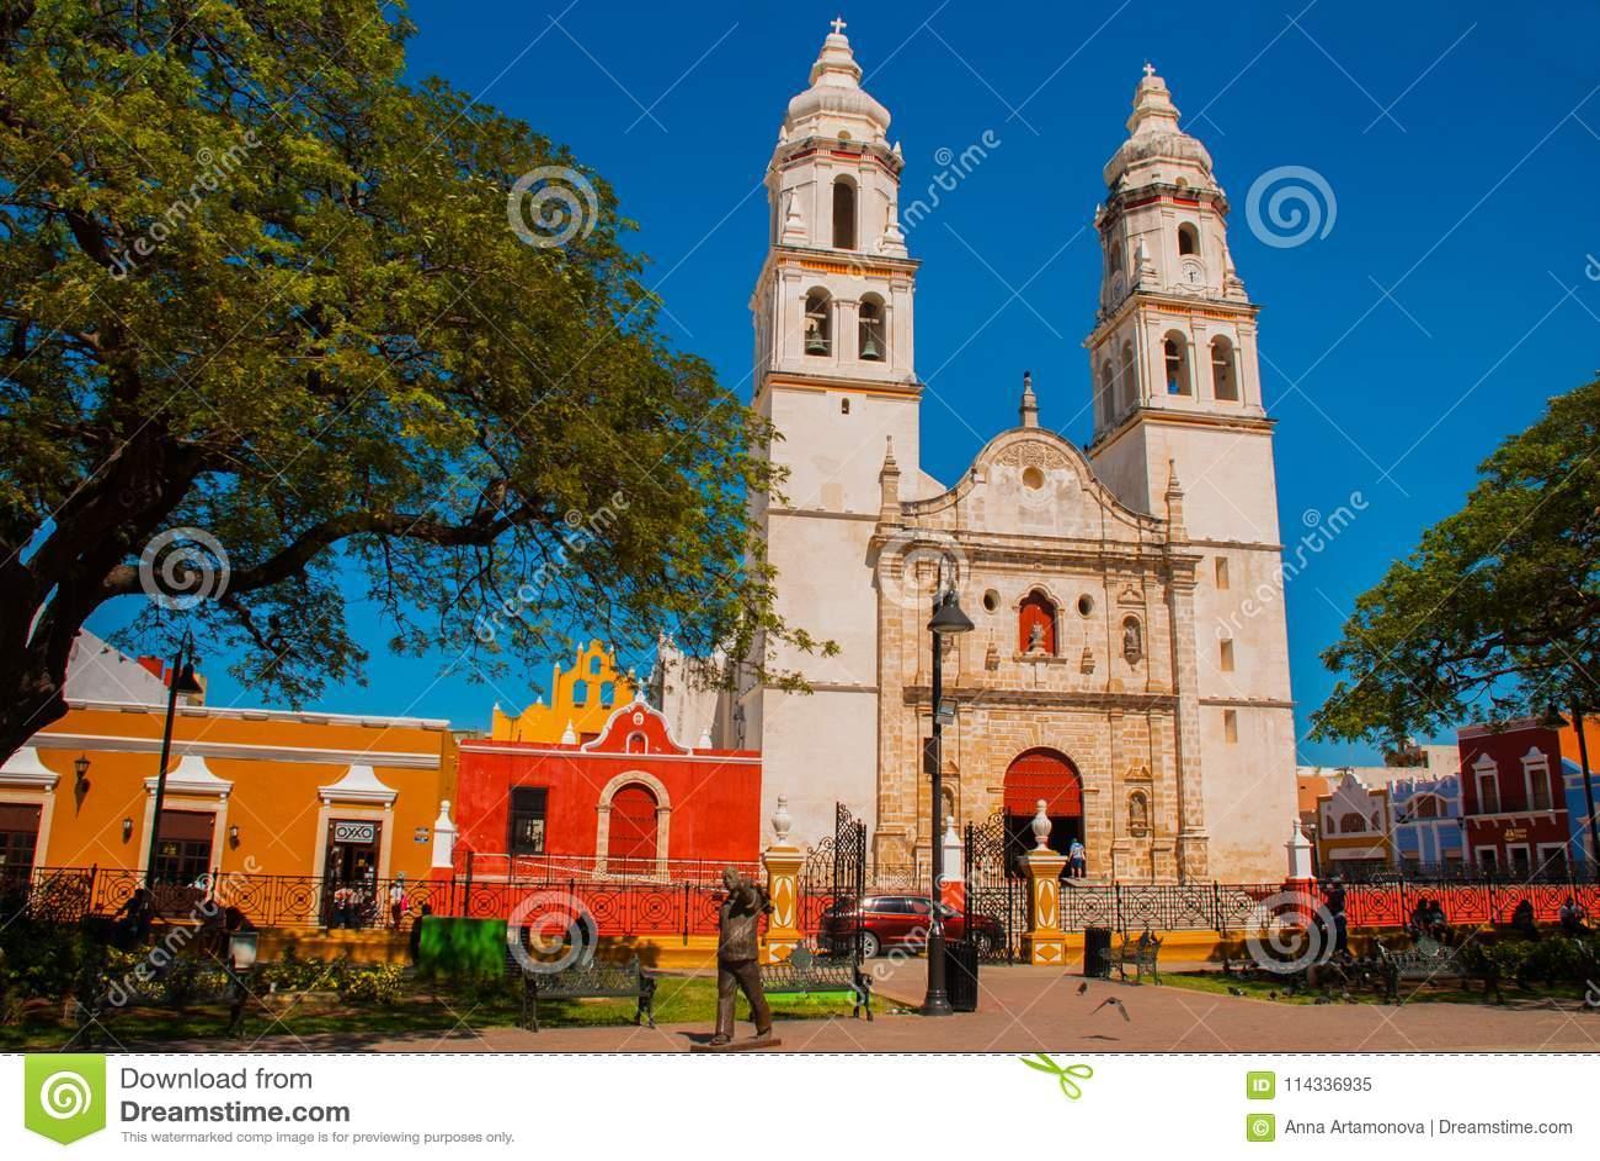 Cathedral, Campeche, Mexico: Plaza de la Independencia, in Campeche, Mexico`s Old Town of San Francisco de Campeche